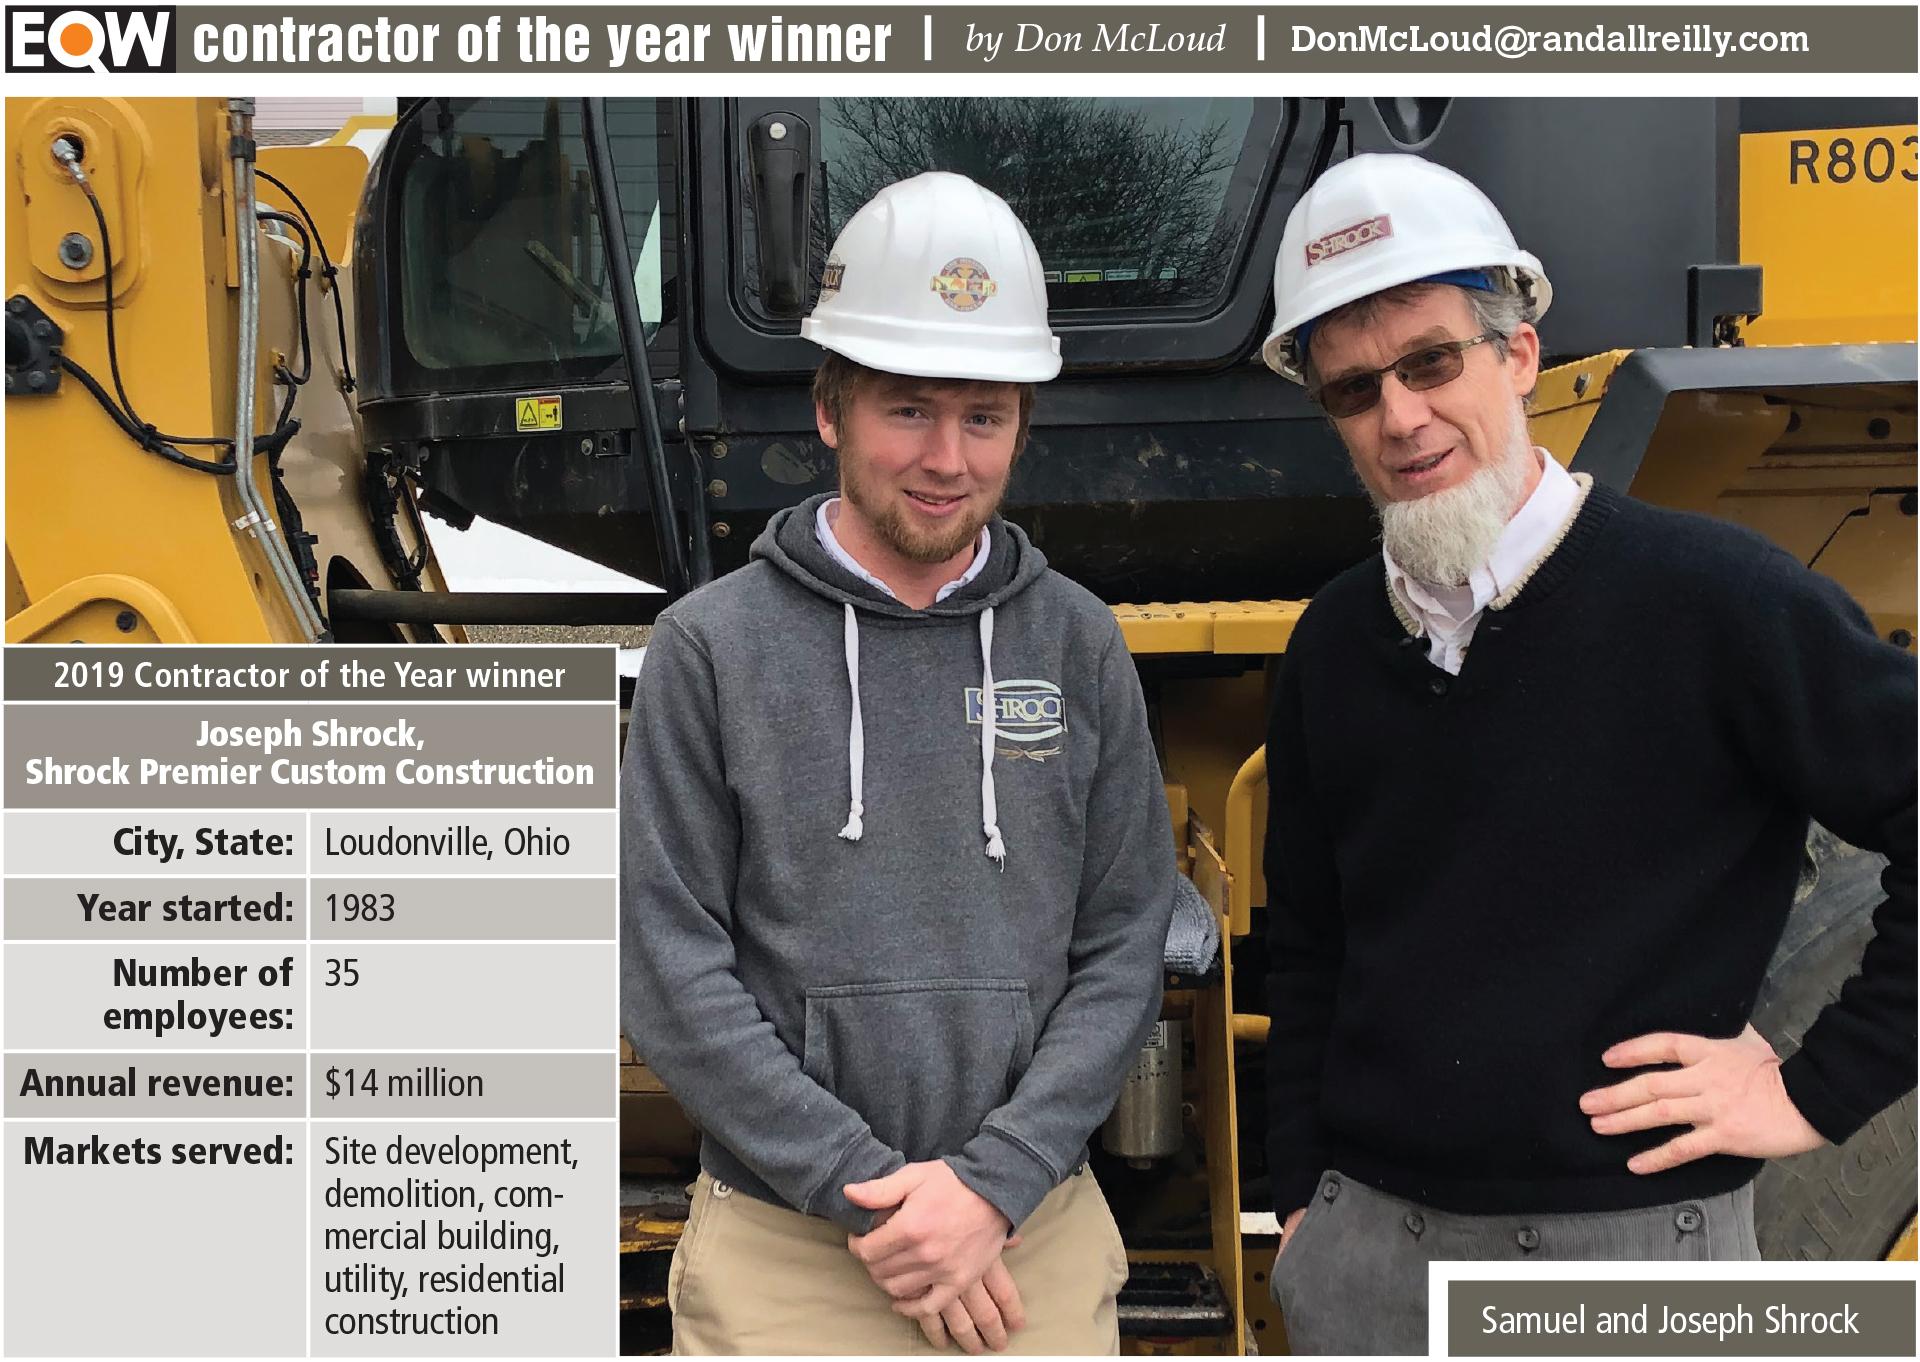 2019 contractor of the year winner joseph shrock